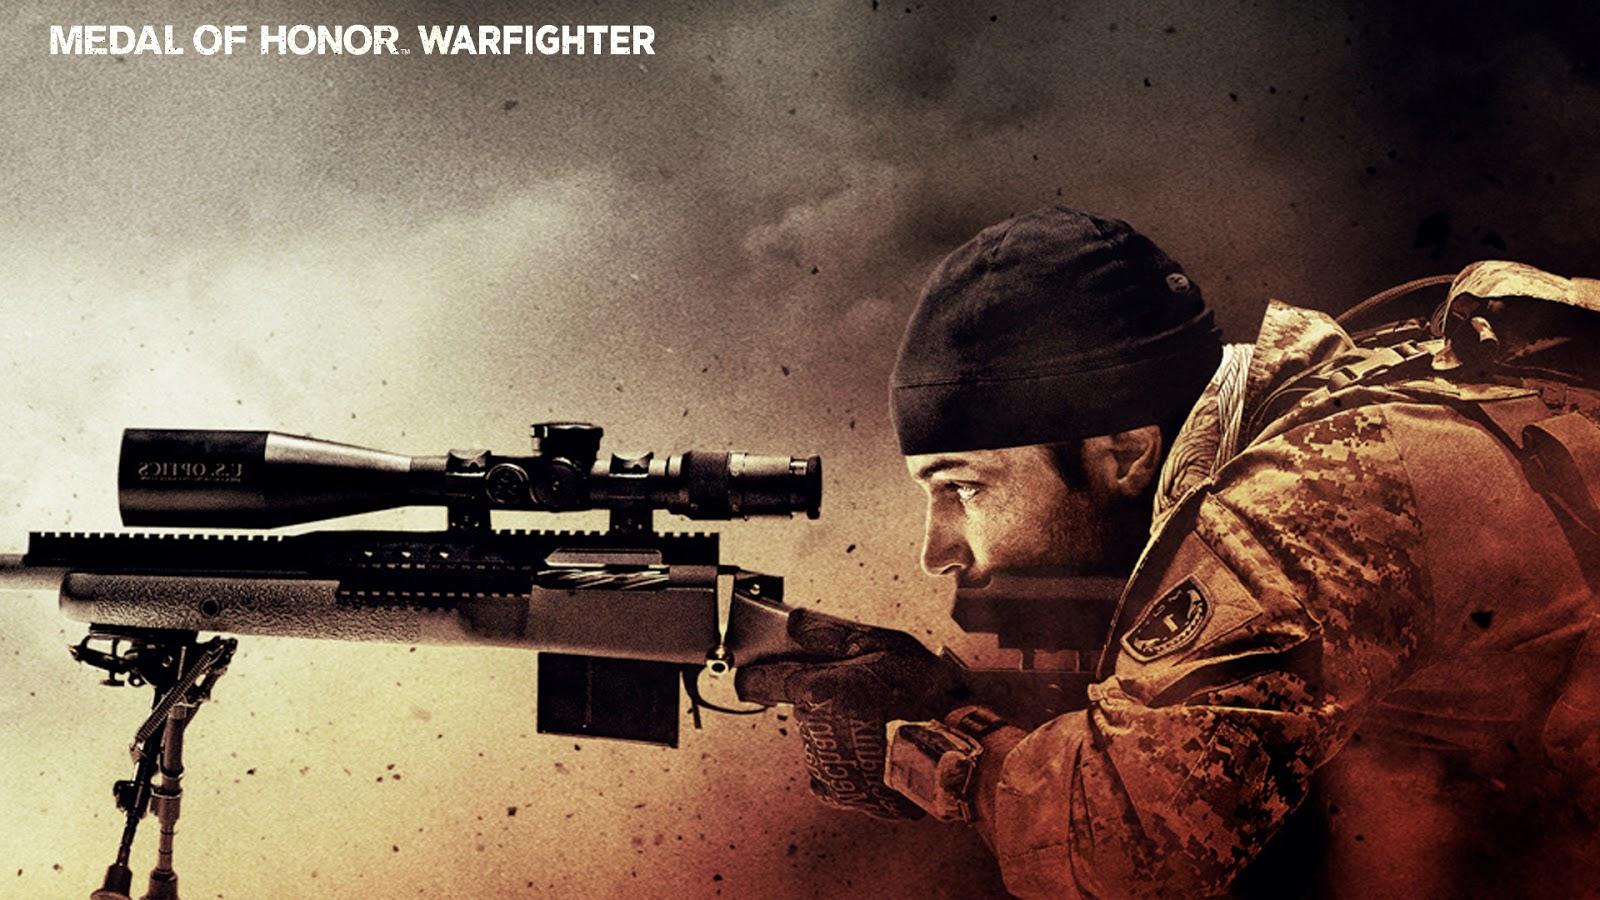 moh warfighter wallpaper hd - photo #7